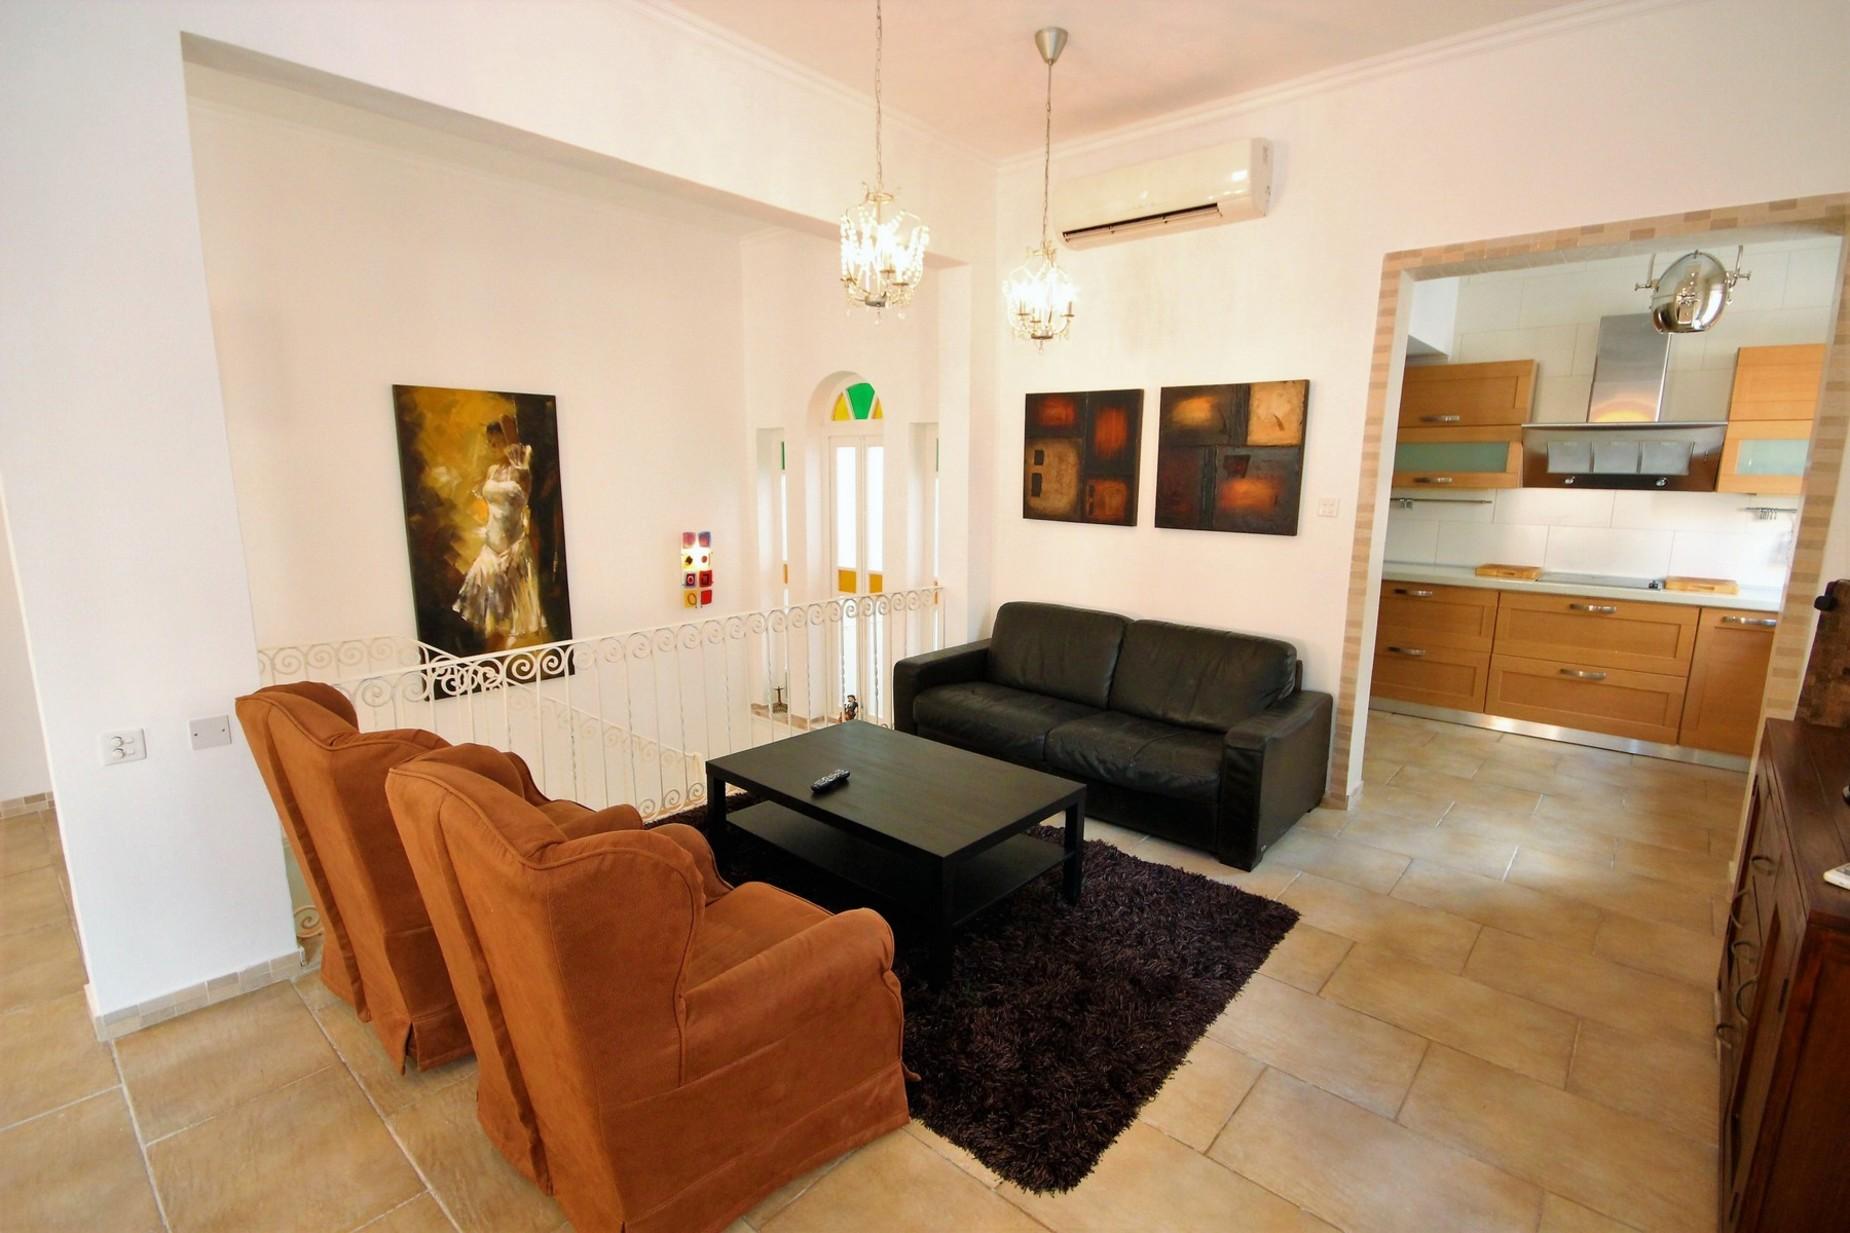 3 bed Town House For Rent in Gzira, Gzira - thumb 2